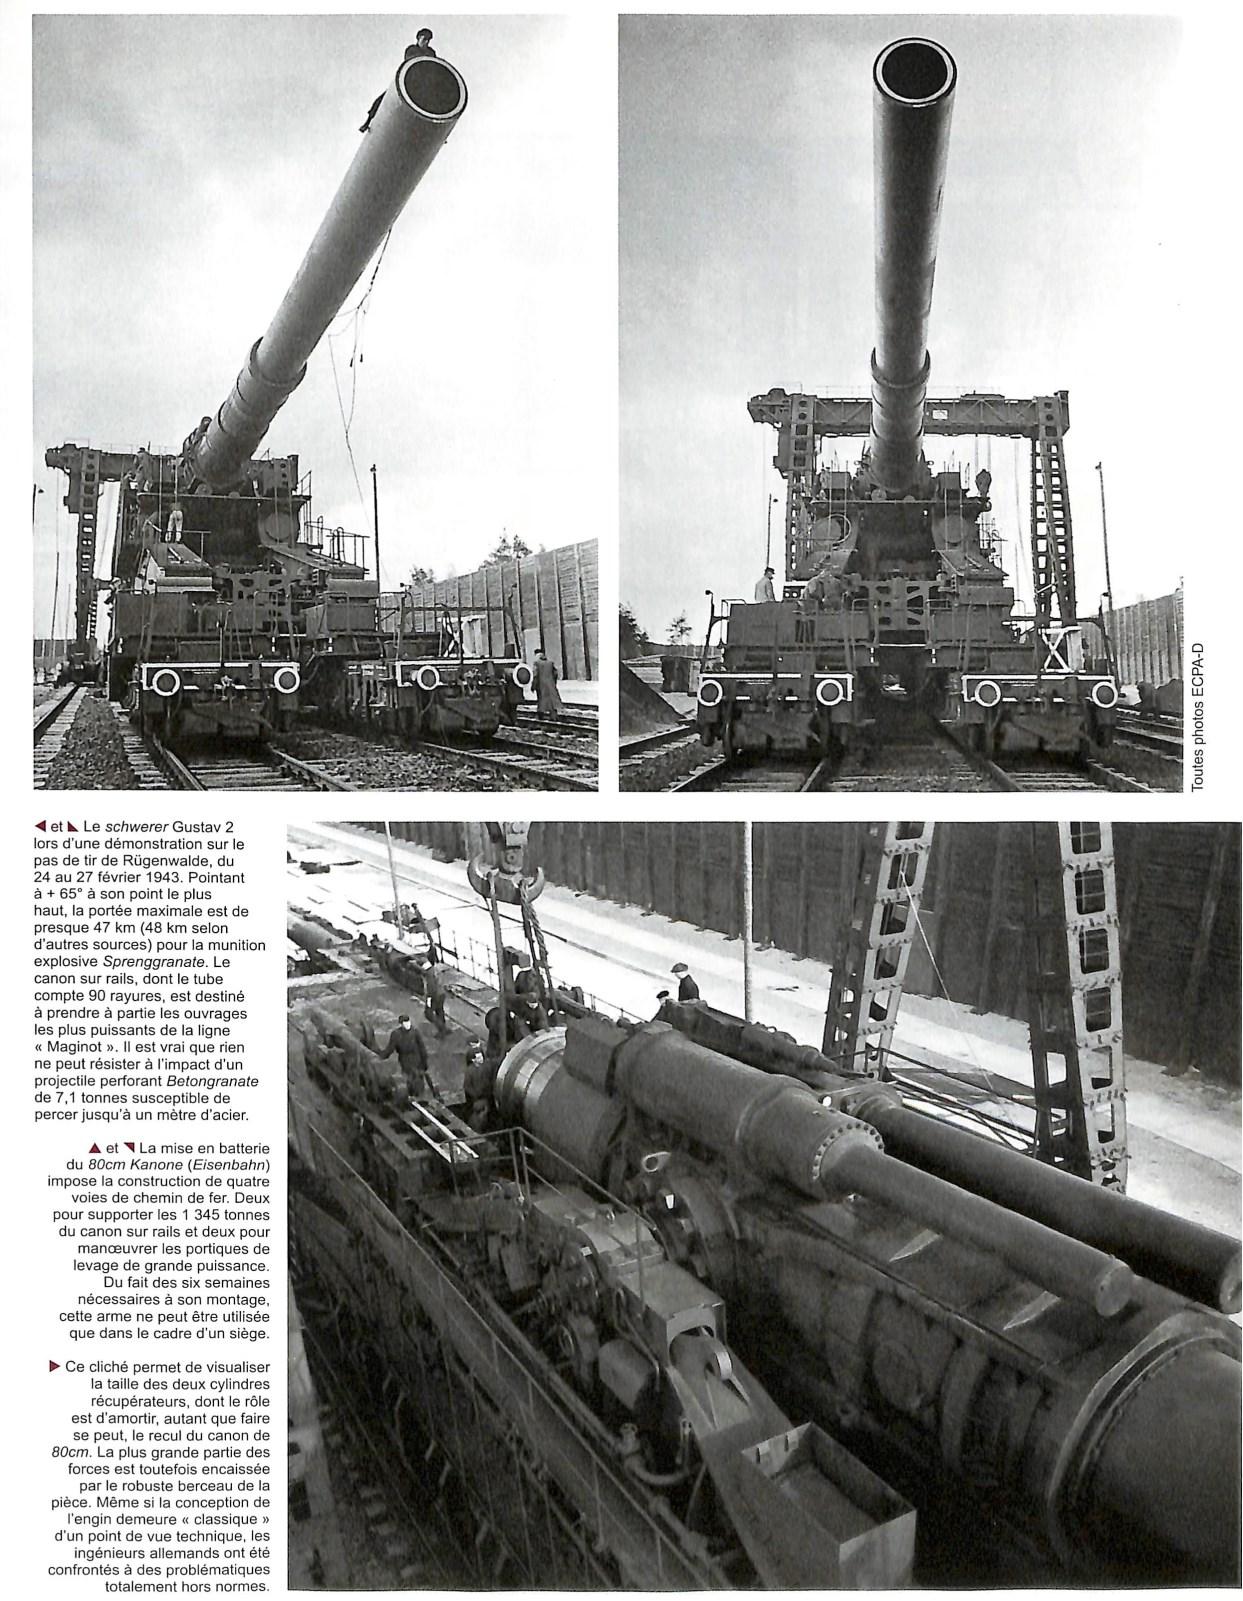 80cm kanone in eisenbahnlafette gustav ger t weapons and warfare. Black Bedroom Furniture Sets. Home Design Ideas